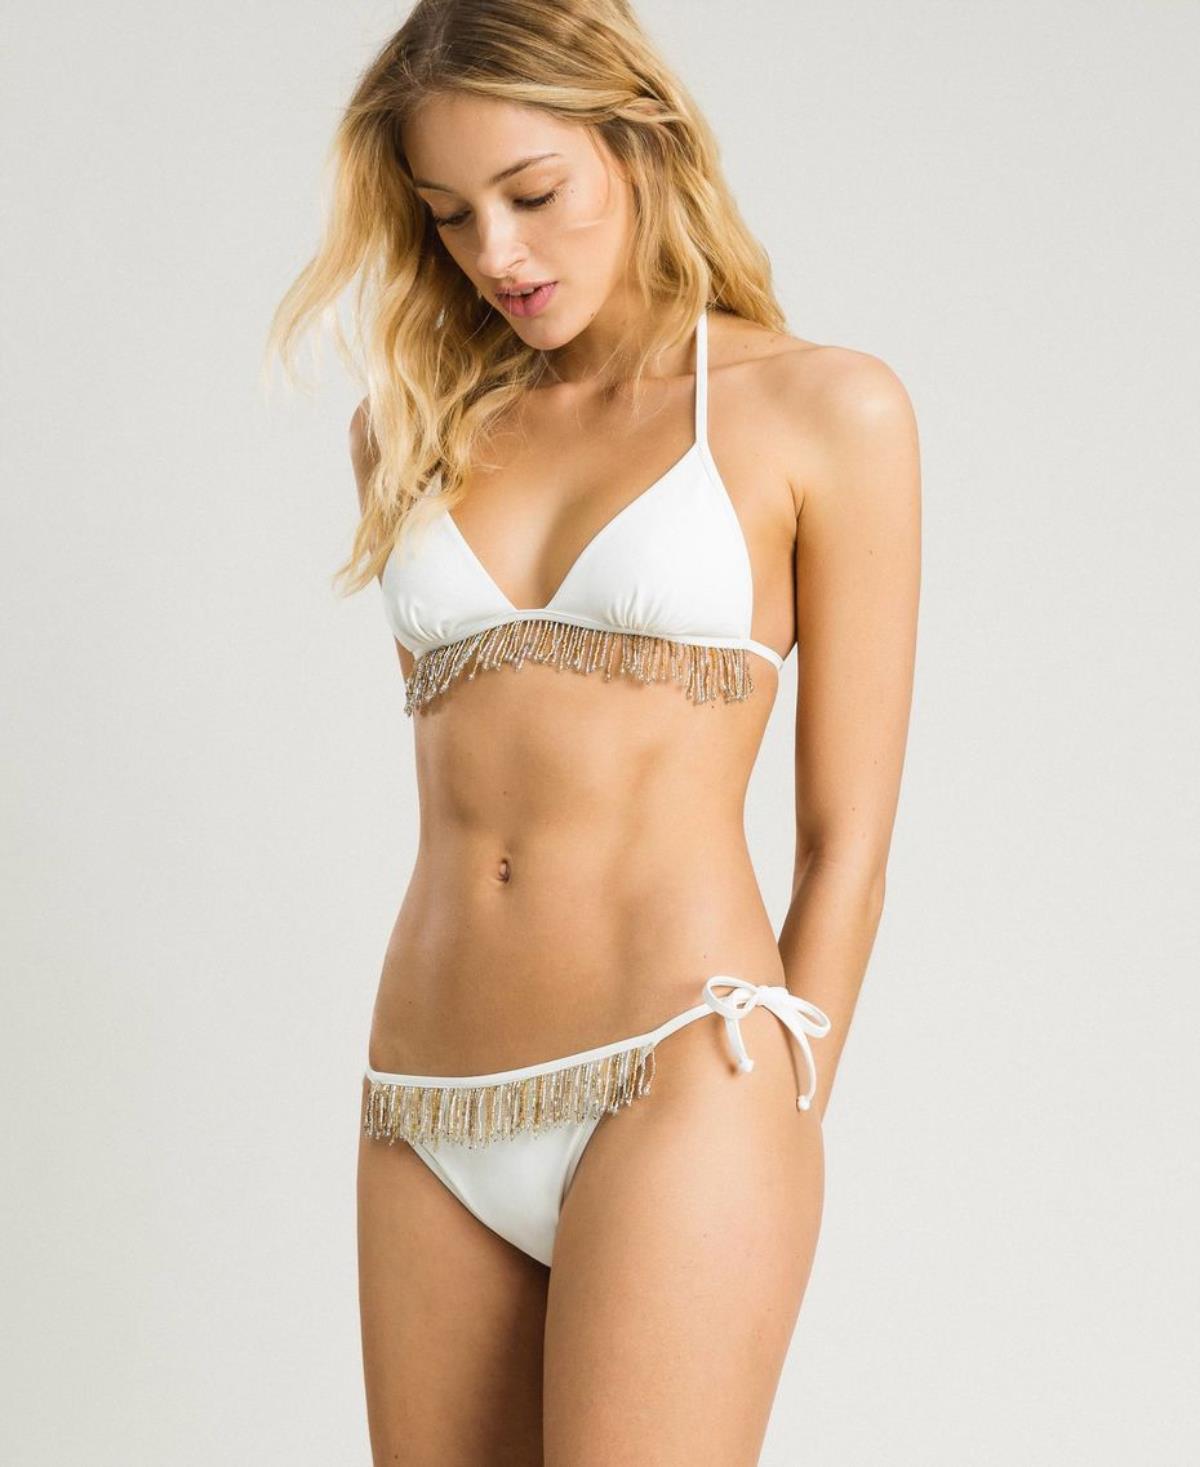 finest selection 501ed 0664c bikini,twin-set,avorio,lamaisonbleue.it,triangolo,top,imbottitura,staccabile,frangetta,corallini,pendenti,